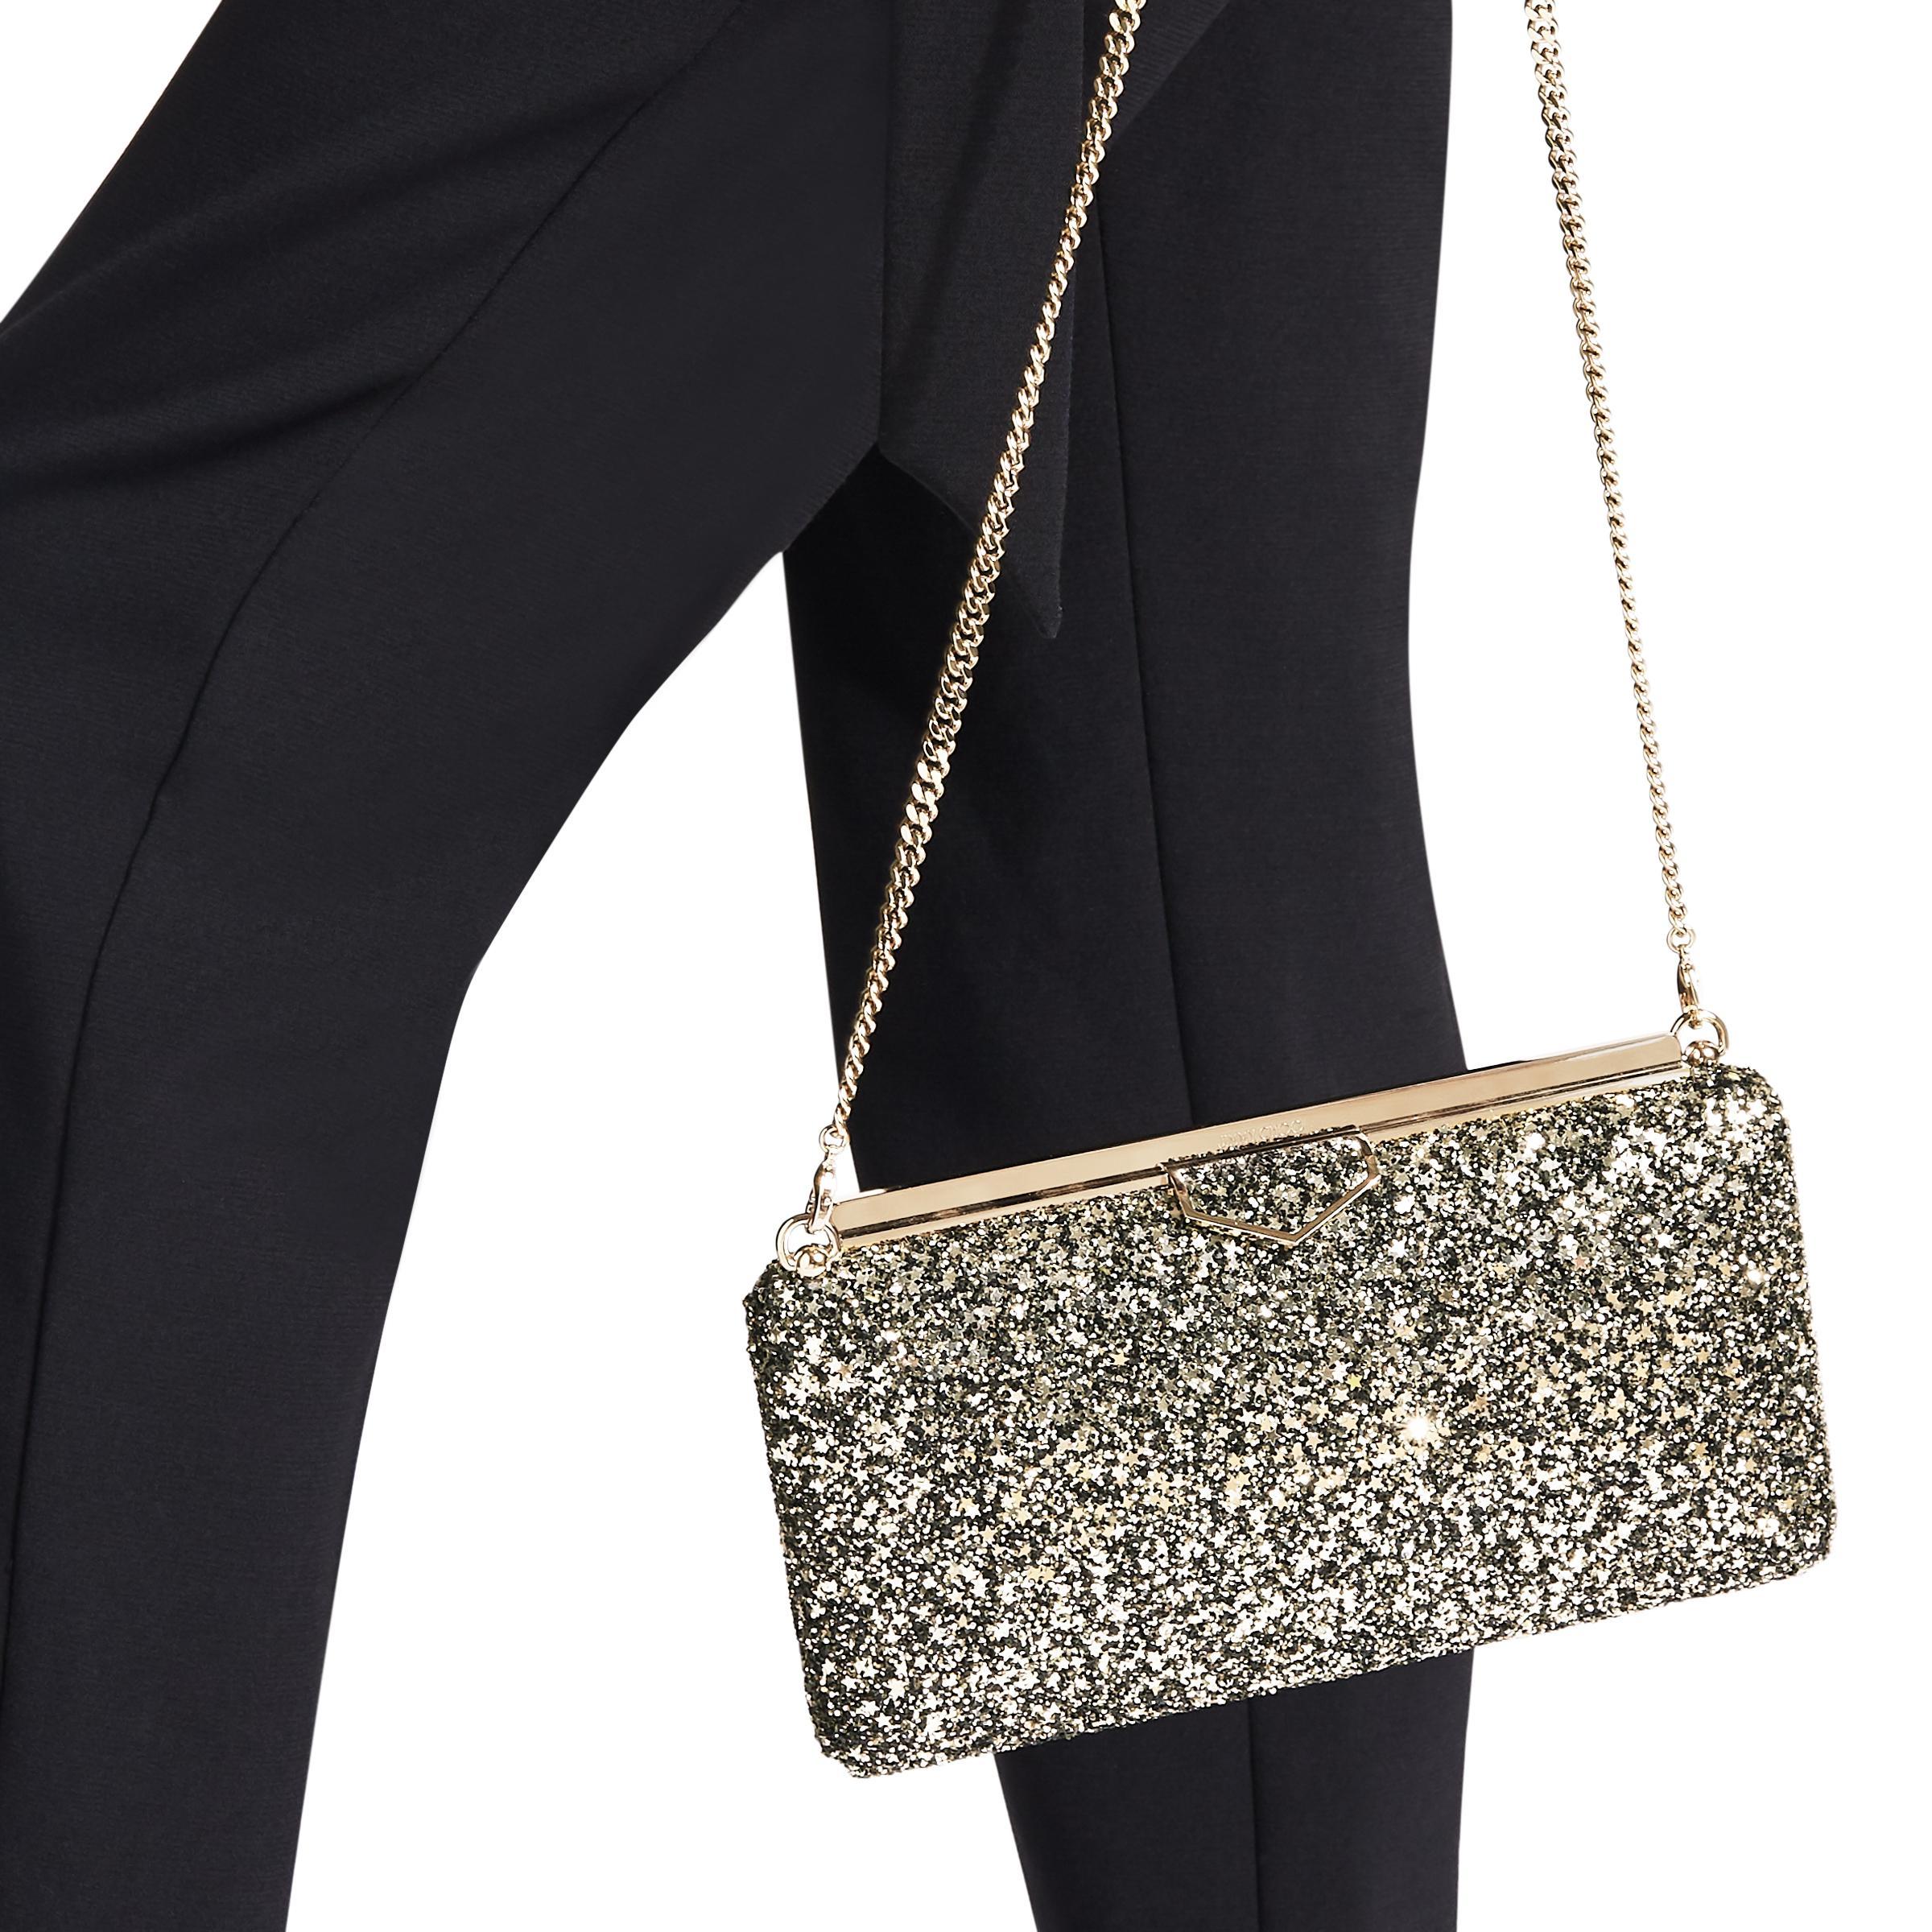 b9096efe3d Jimmy Choo Ellipse Gold Mix Clutch Bag In Star Coarse Glitter Fabric ...